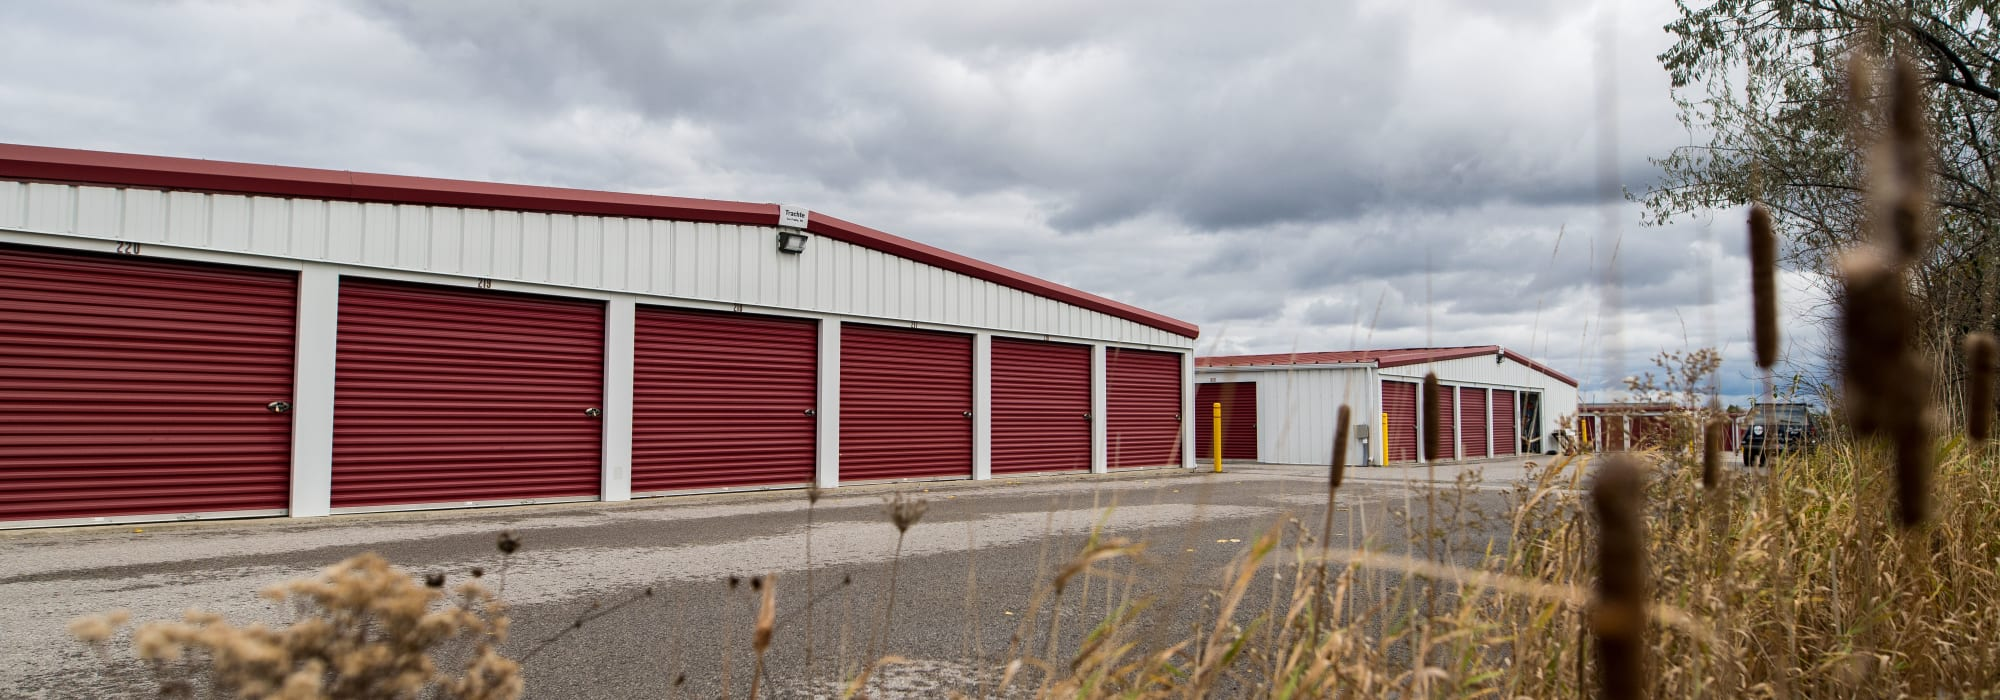 Apple Self Storage - East Gwillimbury in East Gwillimbury, Ontario